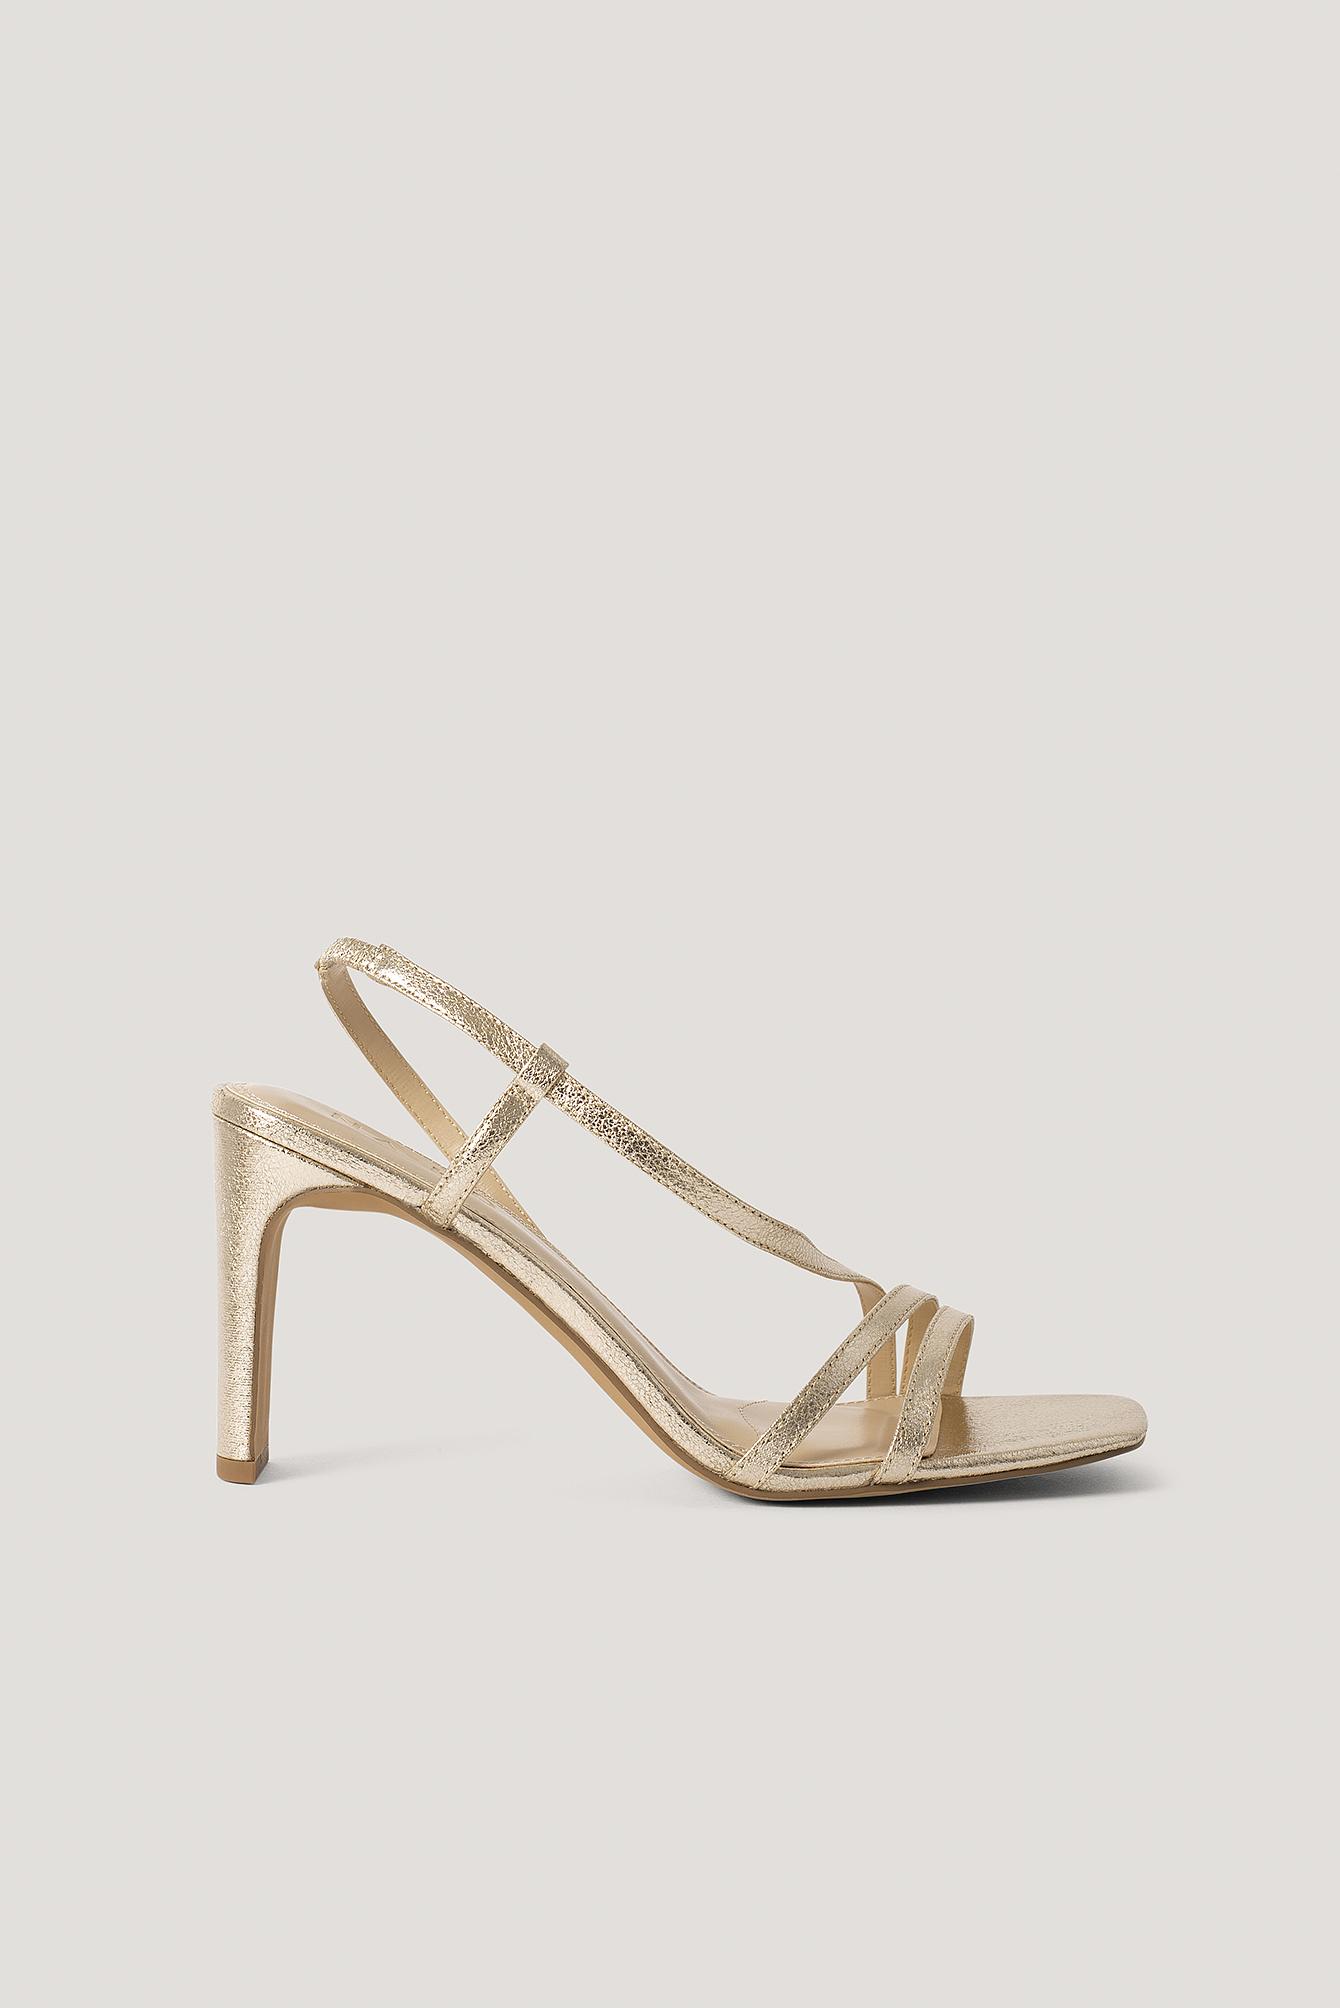 NA-KD Shoes Sandale Mit Hohem Absatz - Gold   Schuhe > Sandalen & Zehentrenner > Sandalen   NA-KD Shoes